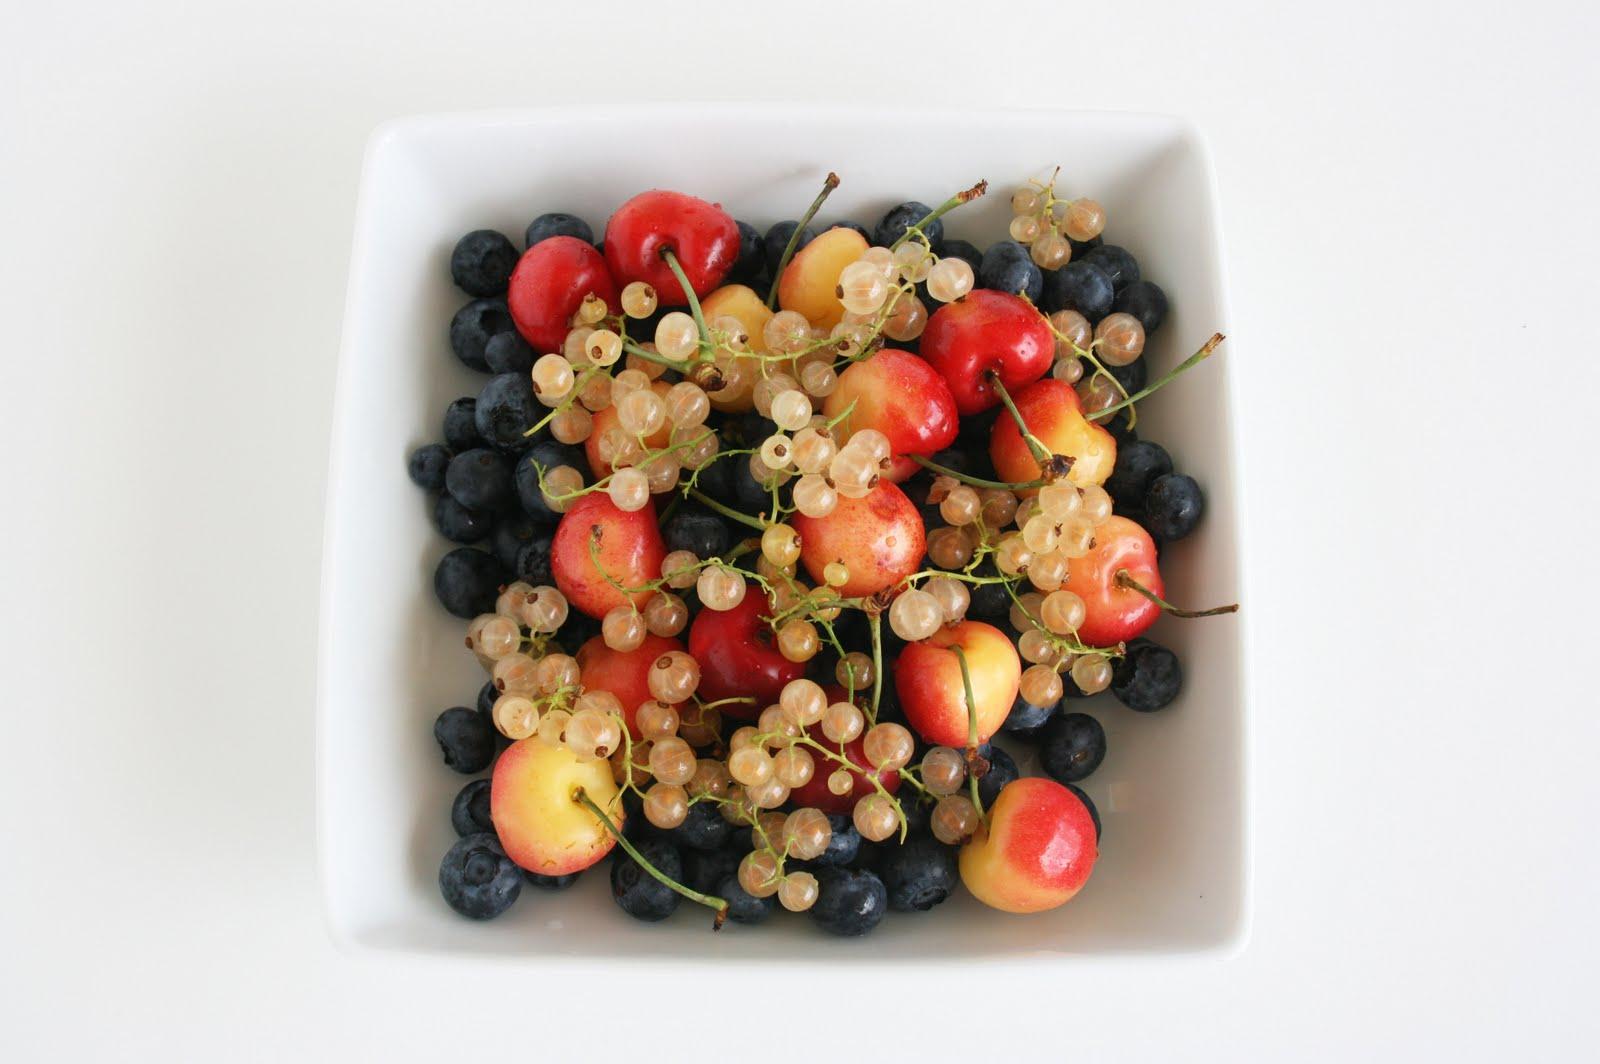 how to use salad cream to make salad